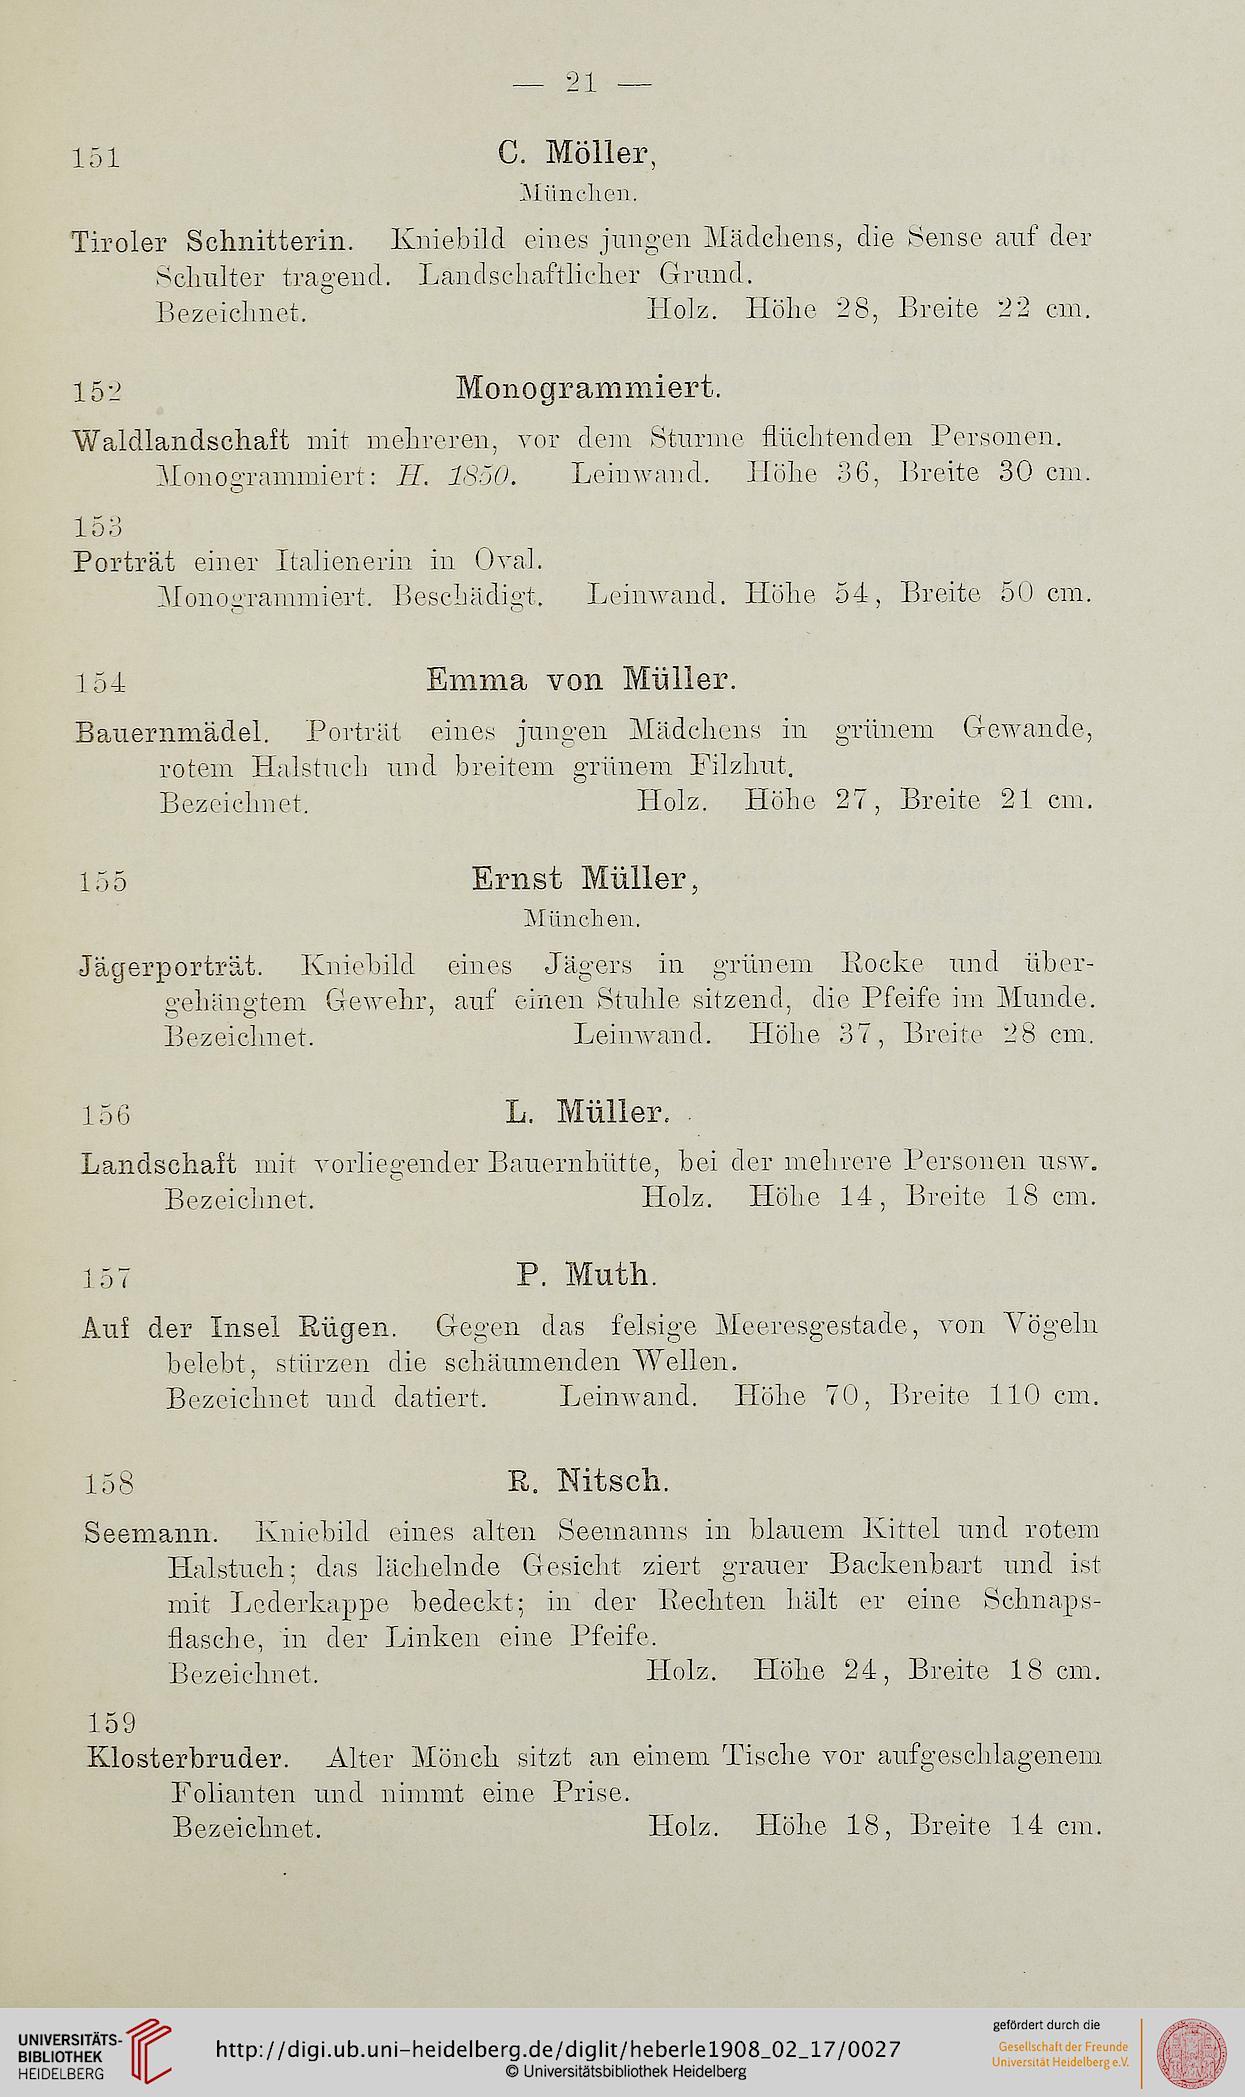 J M Heberle H Lempertz Söhne Hrsg Katalog Gemälde älterer